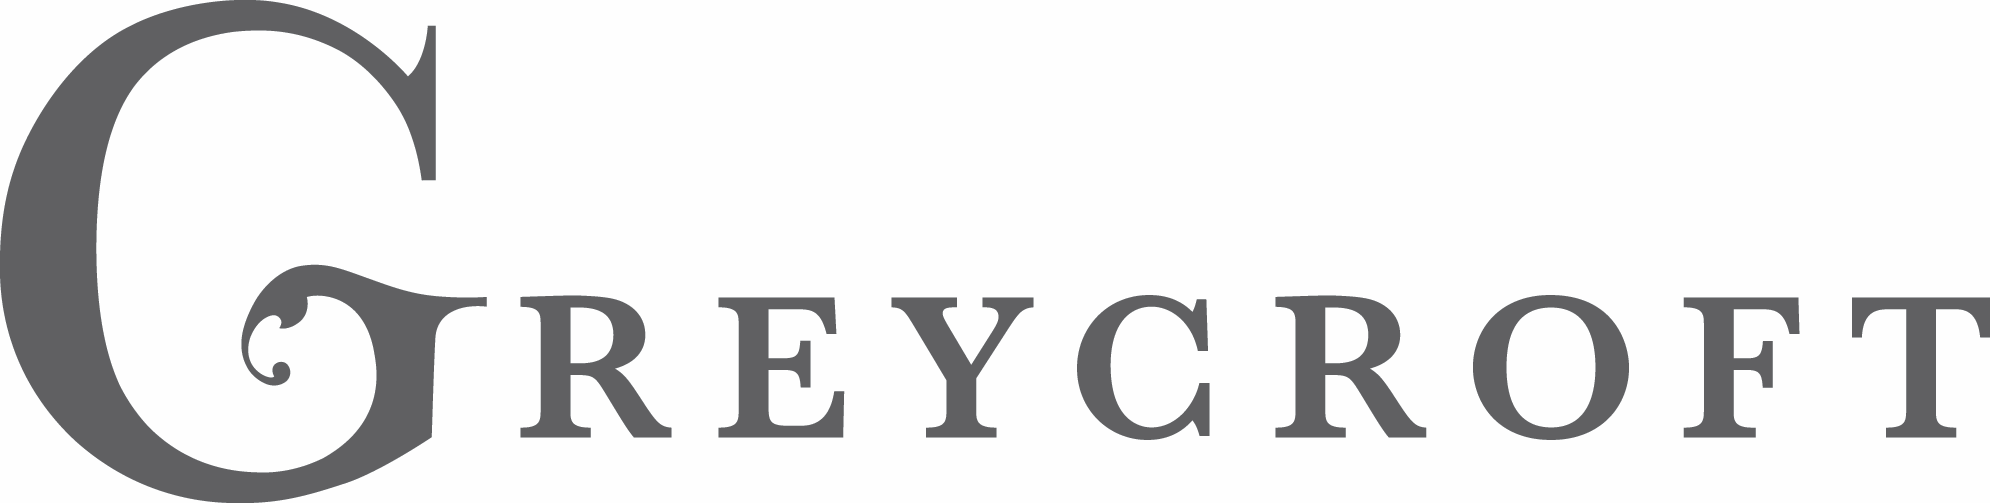 Greycroft_CMYK_logo.png